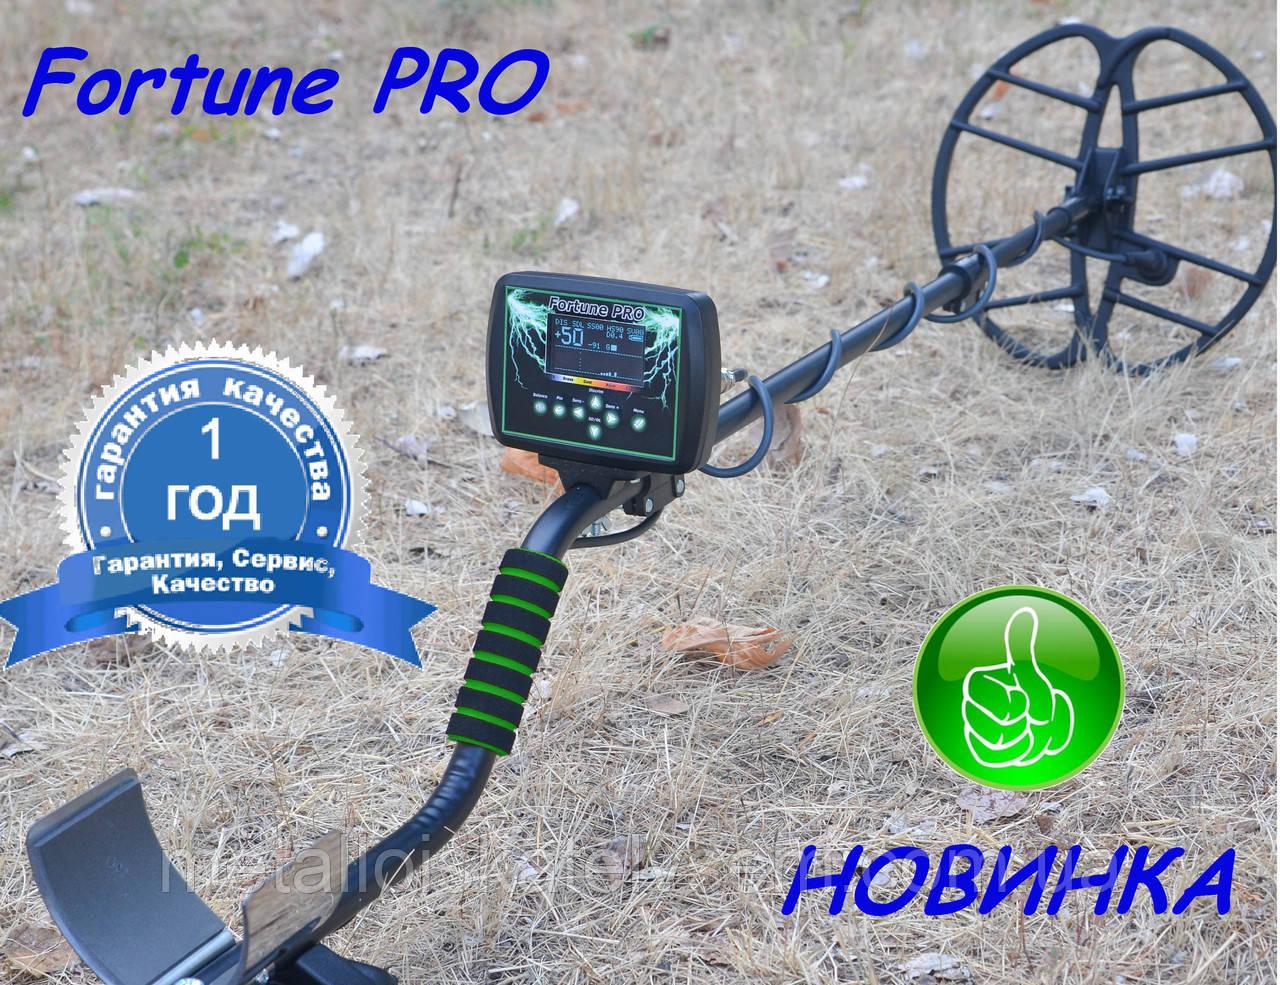 Новинка! Металлоискатель Fortune PRO / Фортуна ПРО OLED-дисплей 6*4. - МеталлоискательВсем) в Черновцах